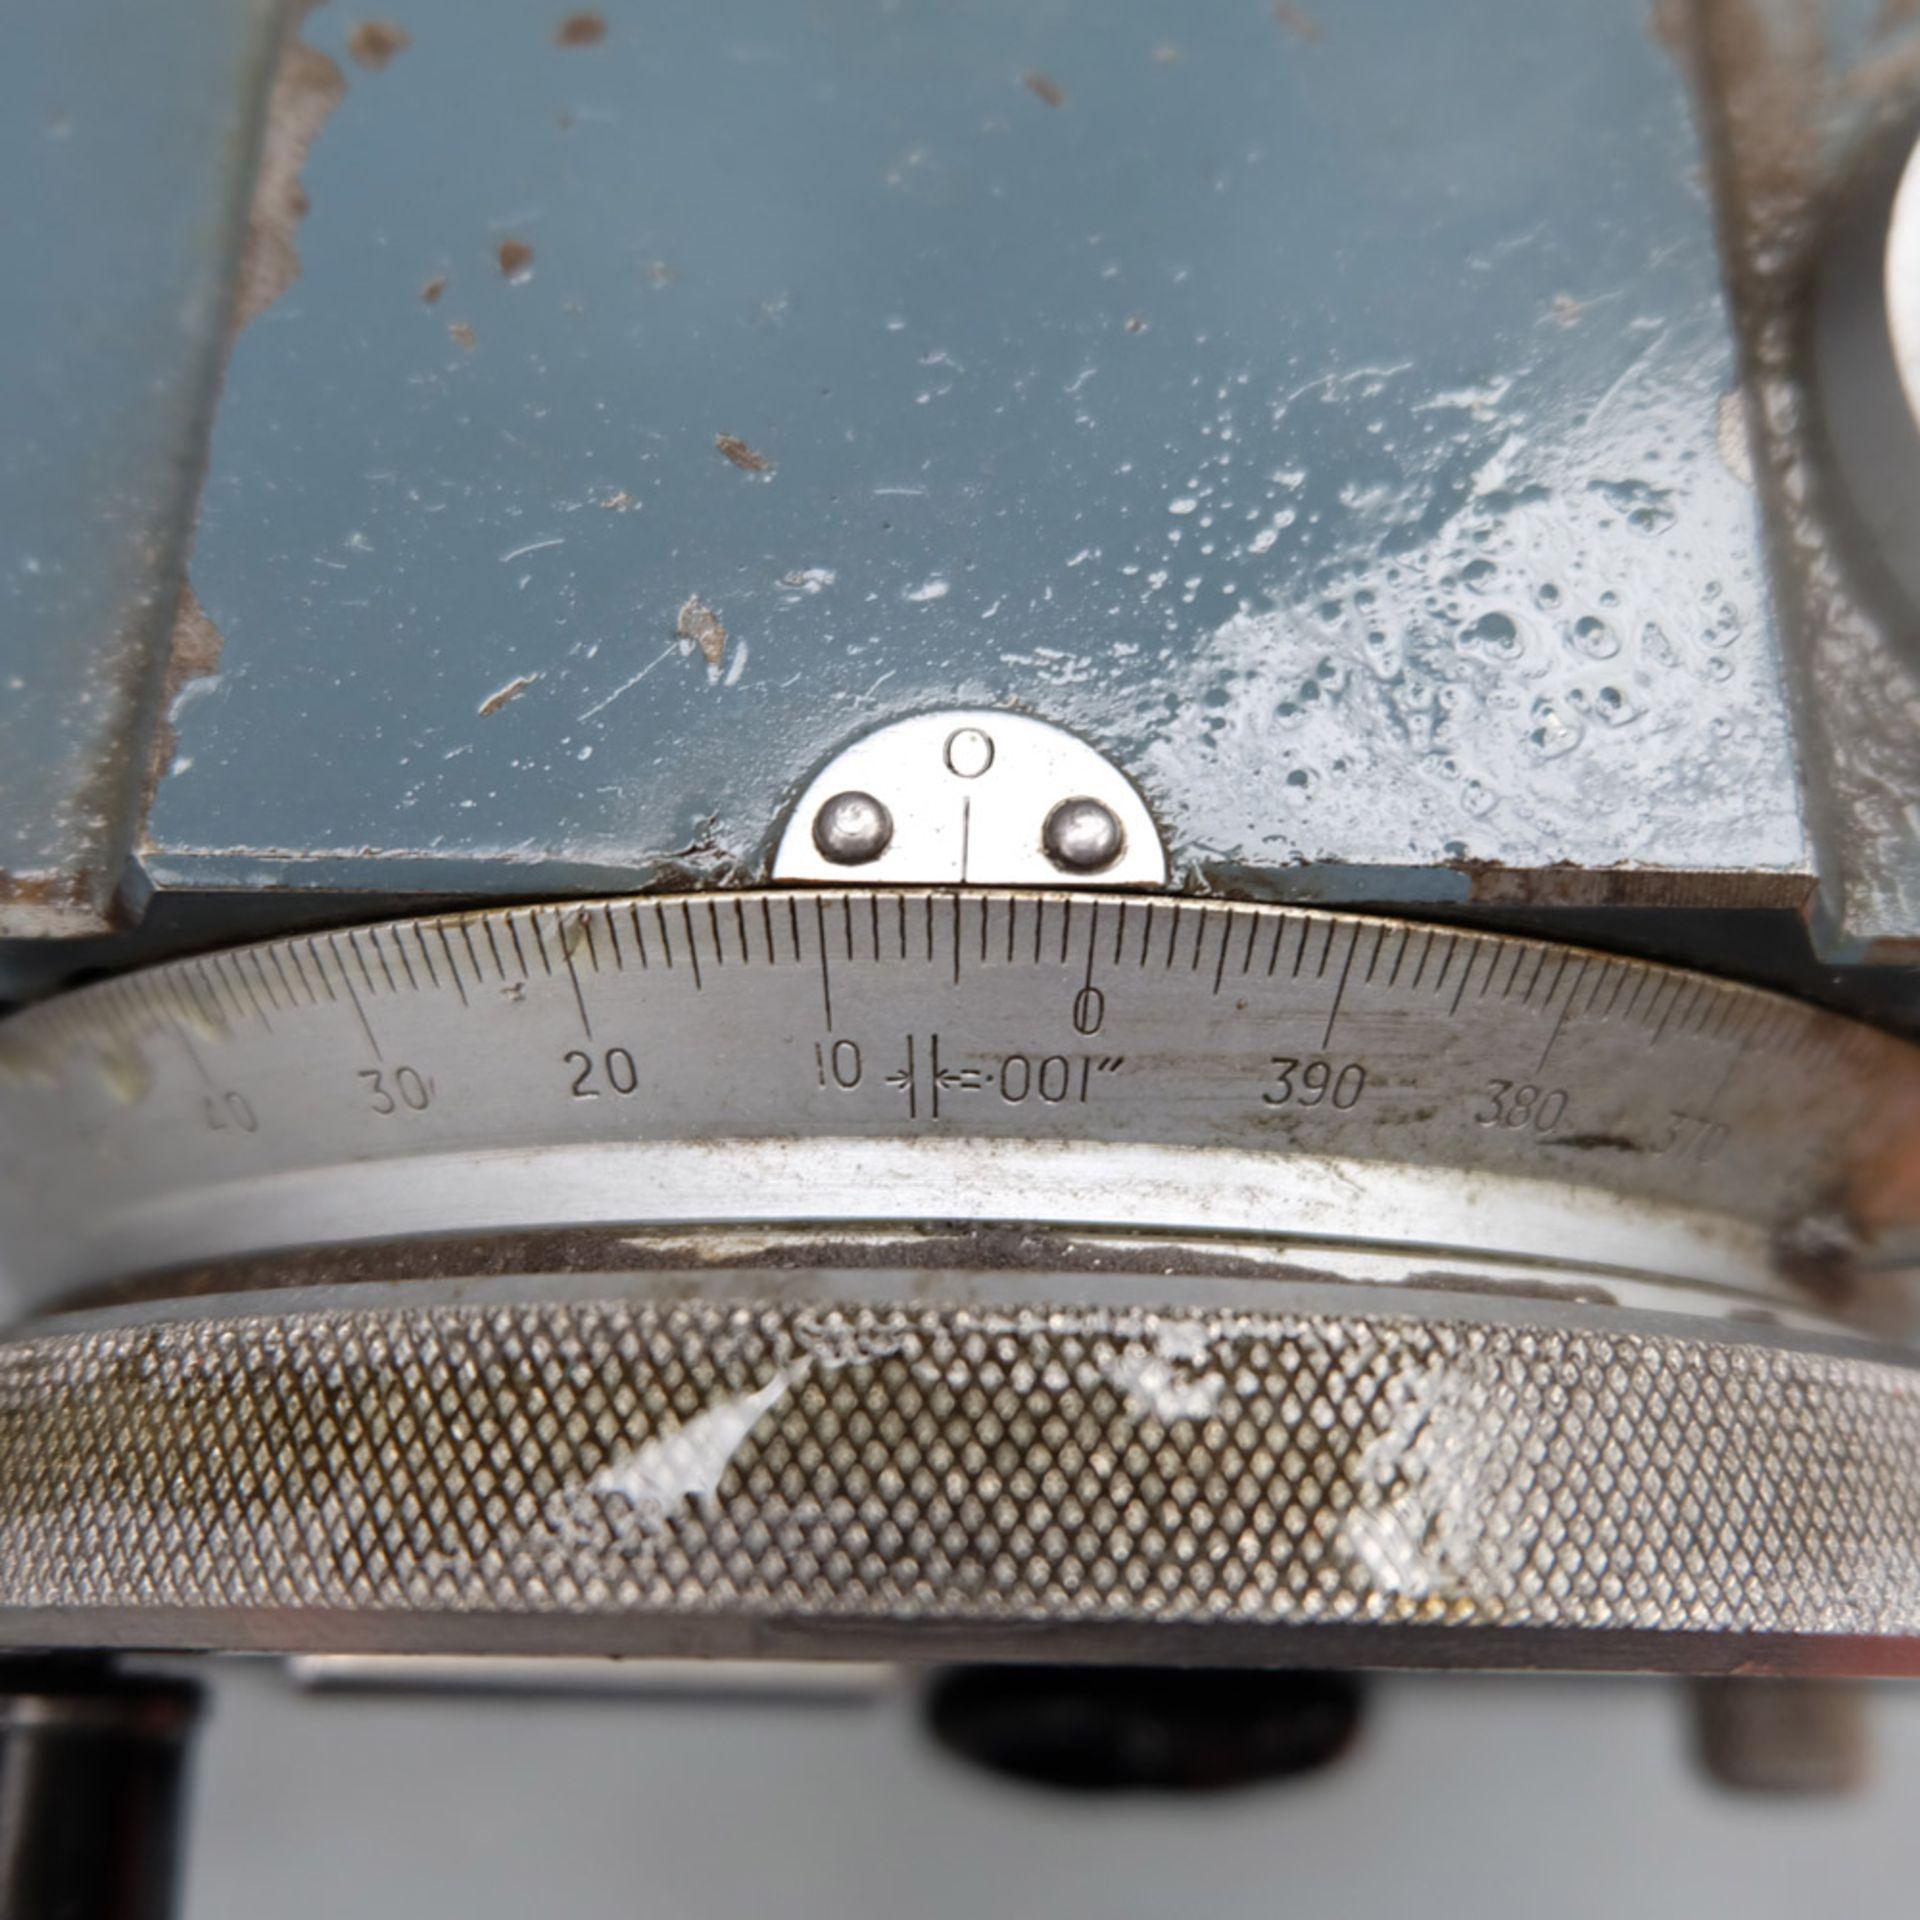 "Jones & Shipman 540P Tool Room Surface Grinder. Capacity 18"" x 6"". - Image 7 of 7"